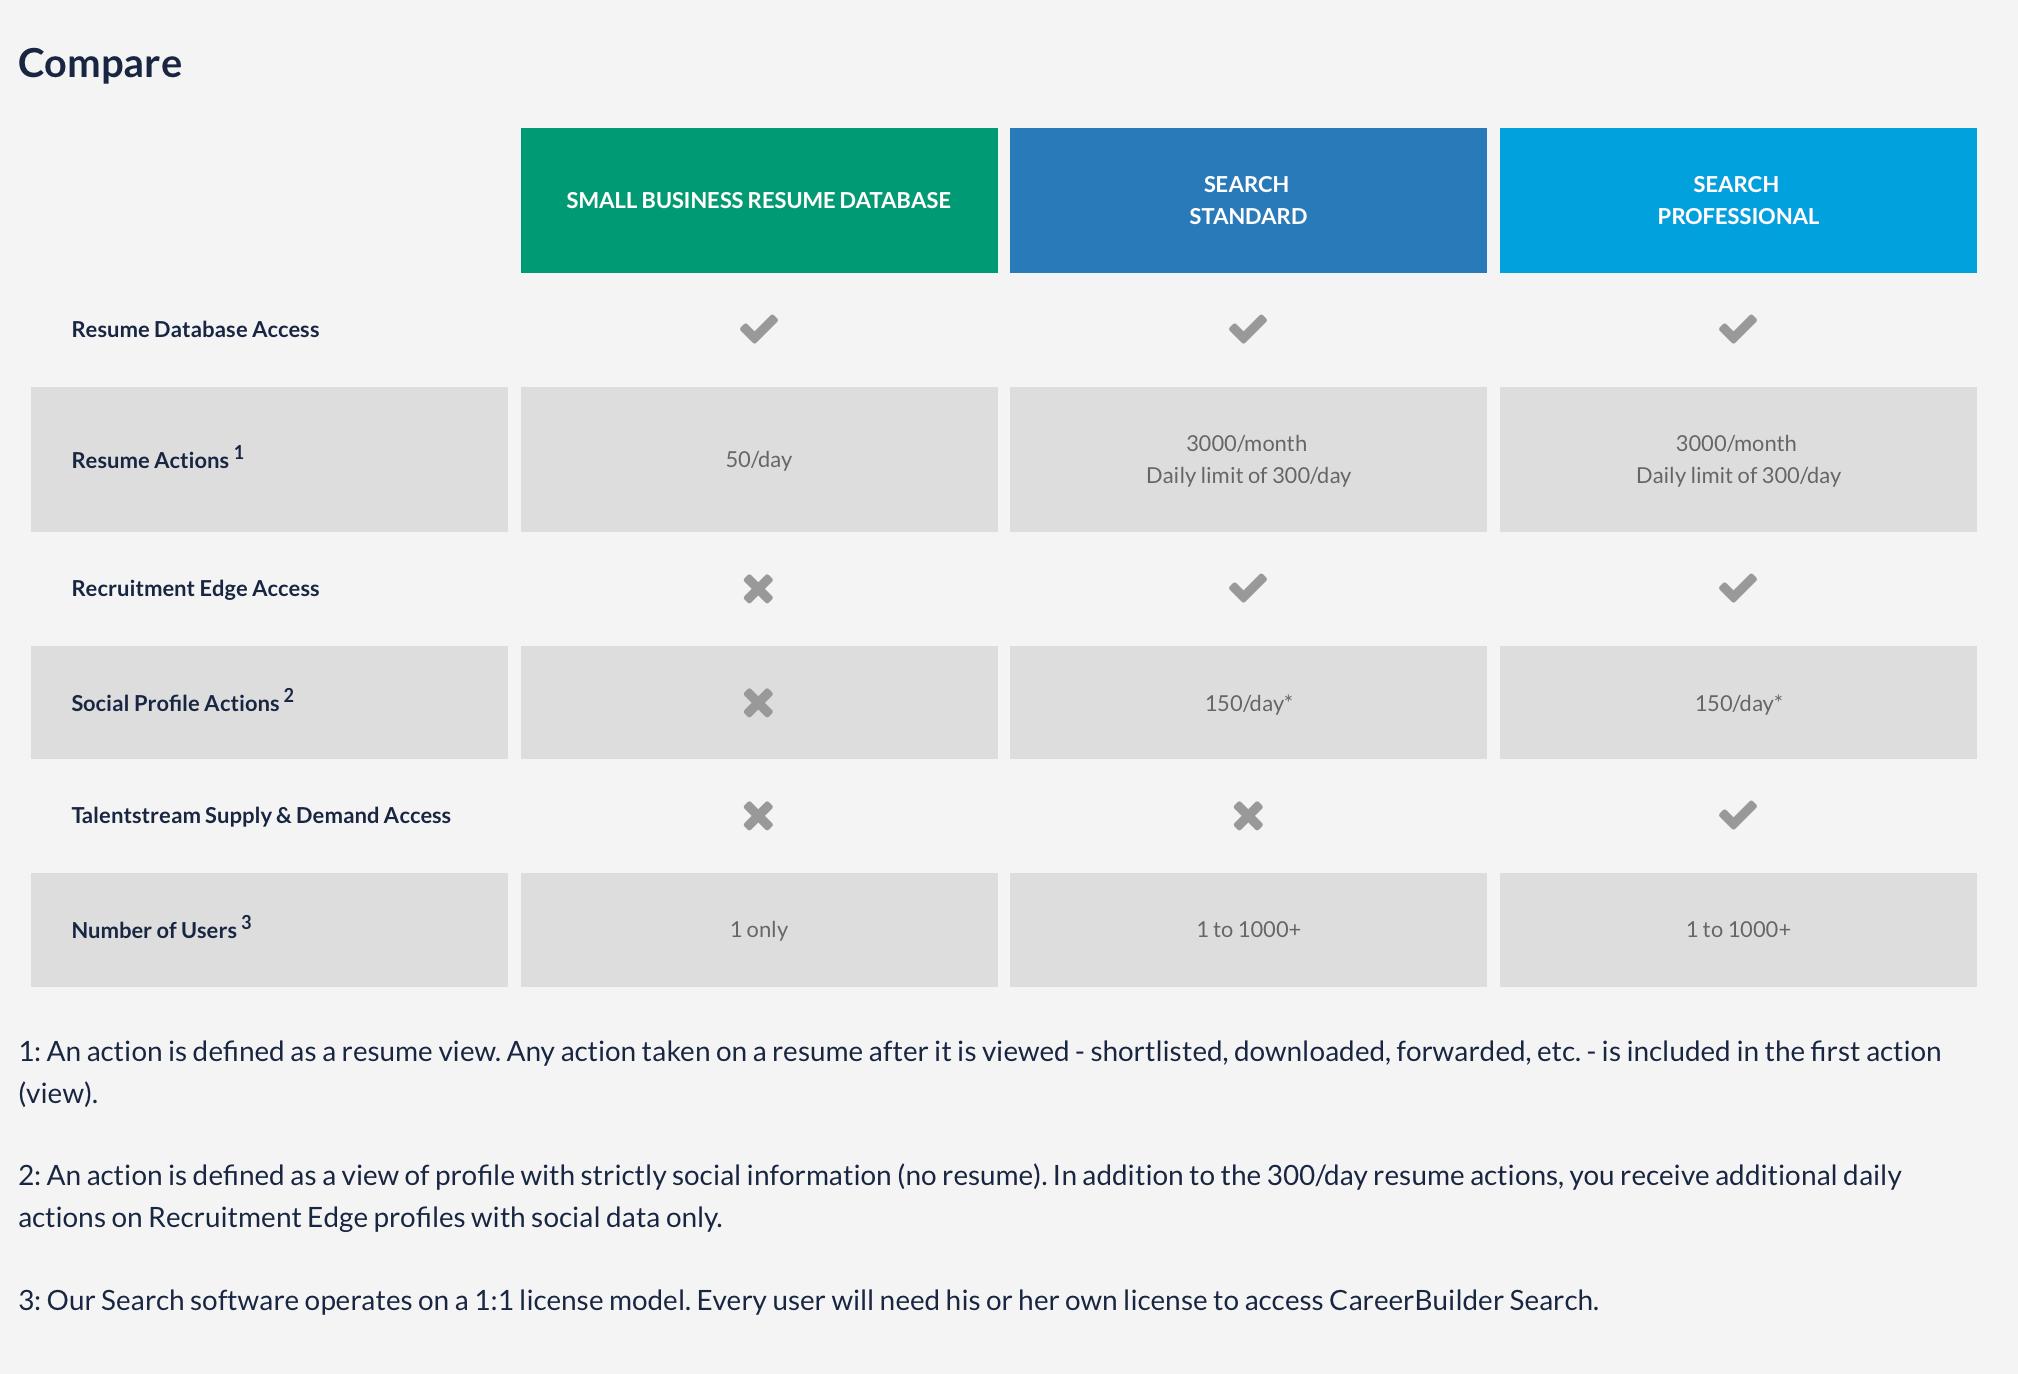 careerbuilder resume search pricing